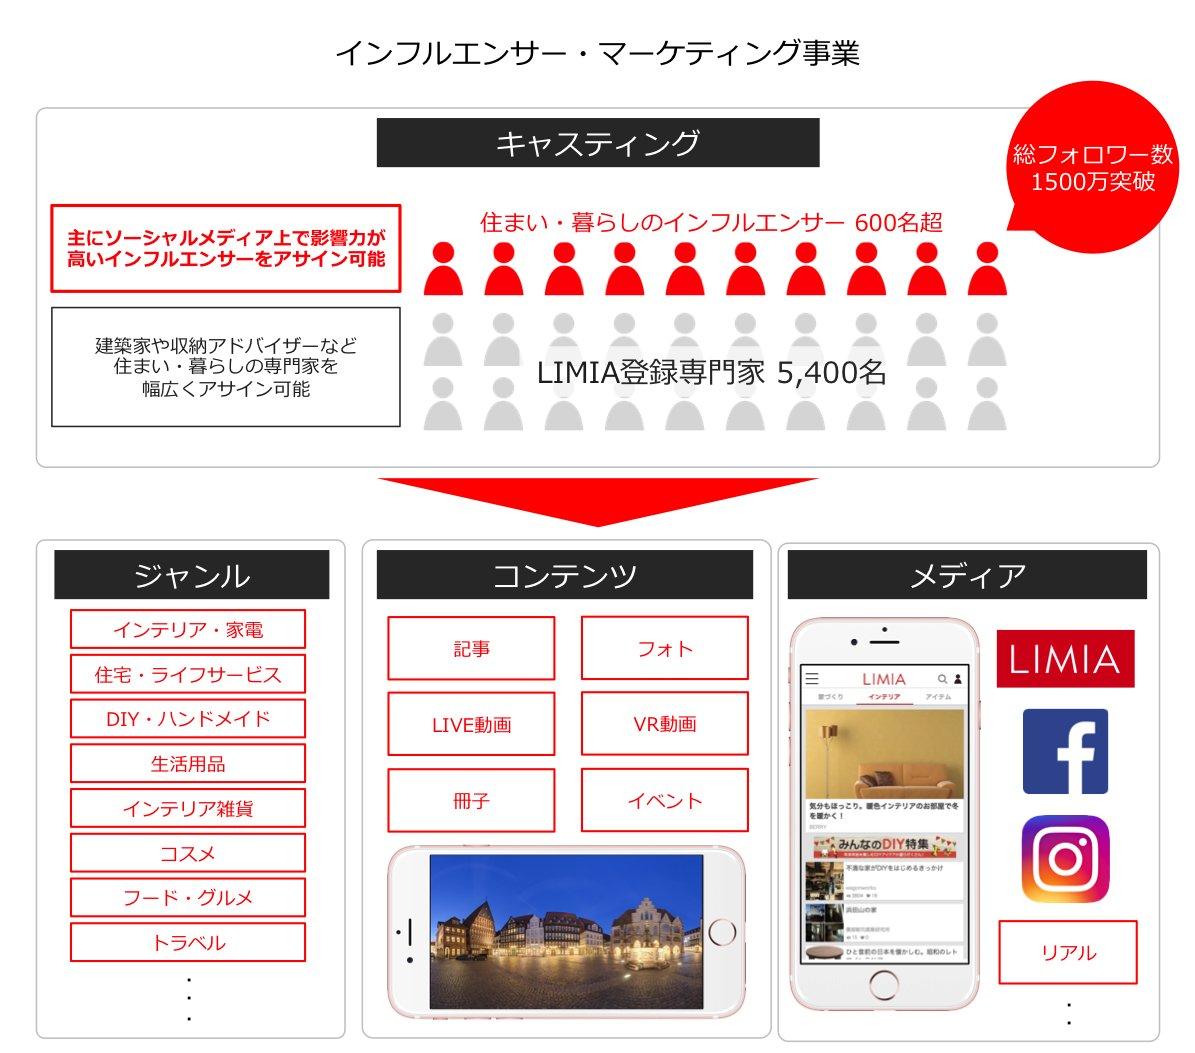 LIMIA(リミア)、住まい・暮らしのインフルエンサーネットワーク 総フォロワー数1500万突破 https://t.co/ix0DkiivZo